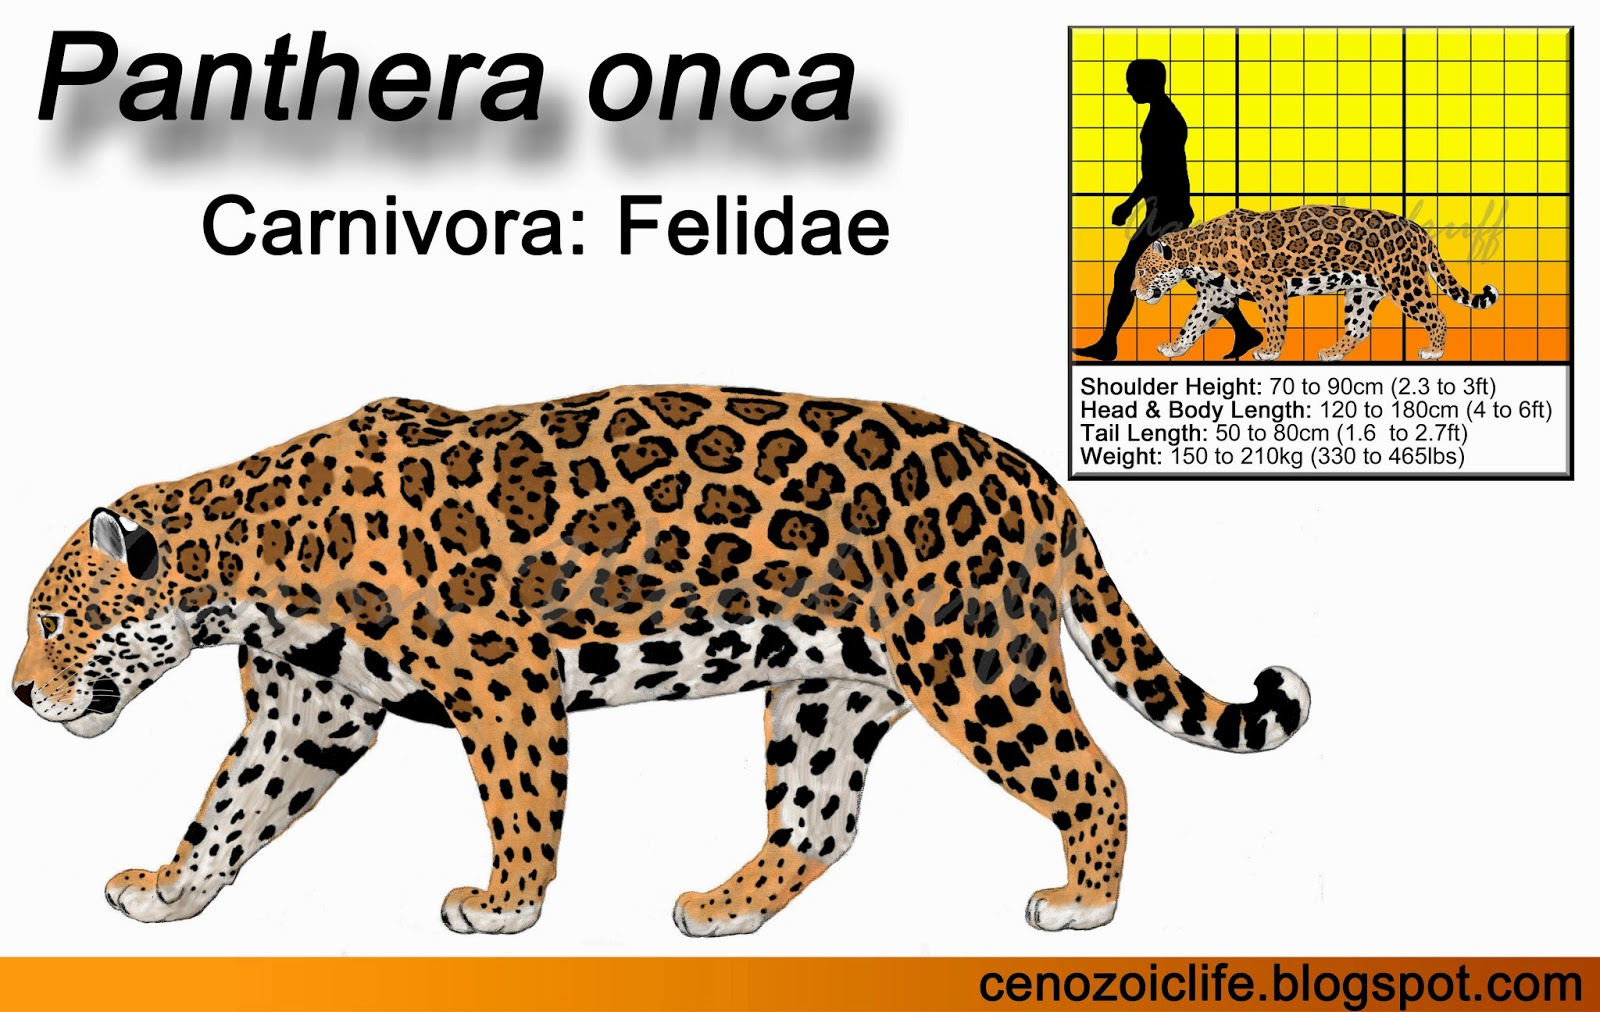 life in the cenozoic era: jaguar (panthera onca)